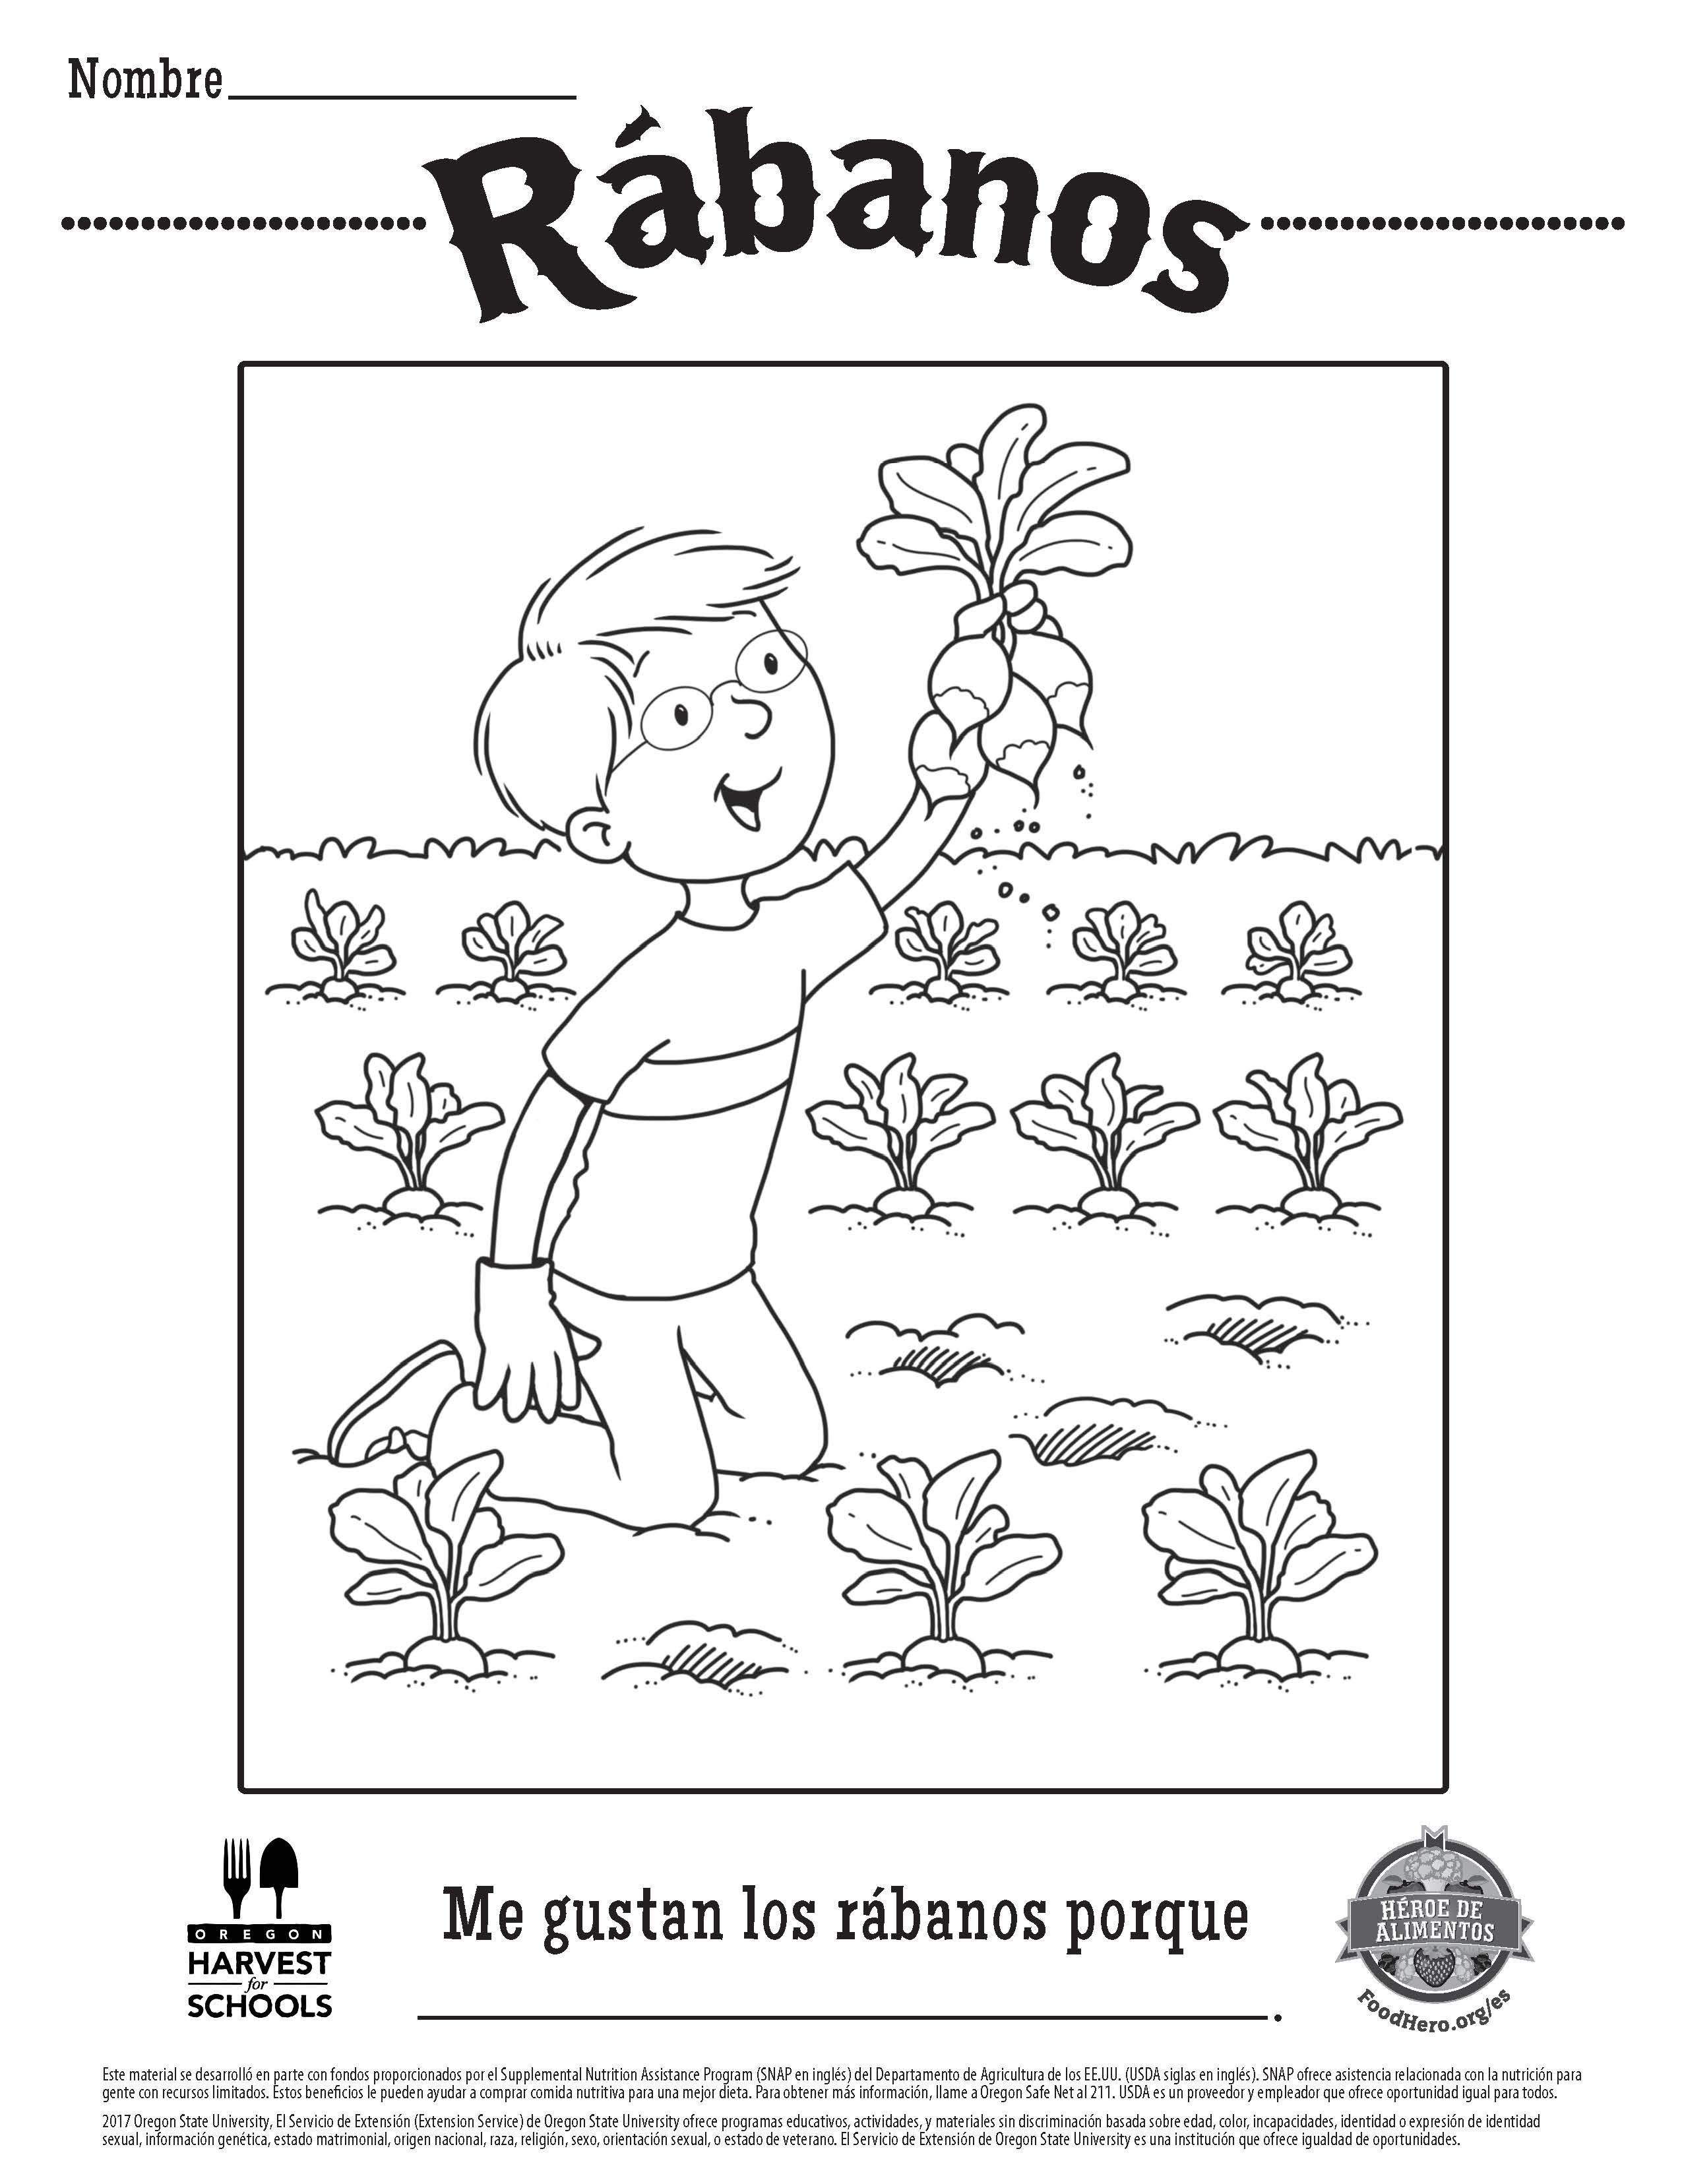 Radishes Free Printable Food Hero Coloring Sheet in Spanish